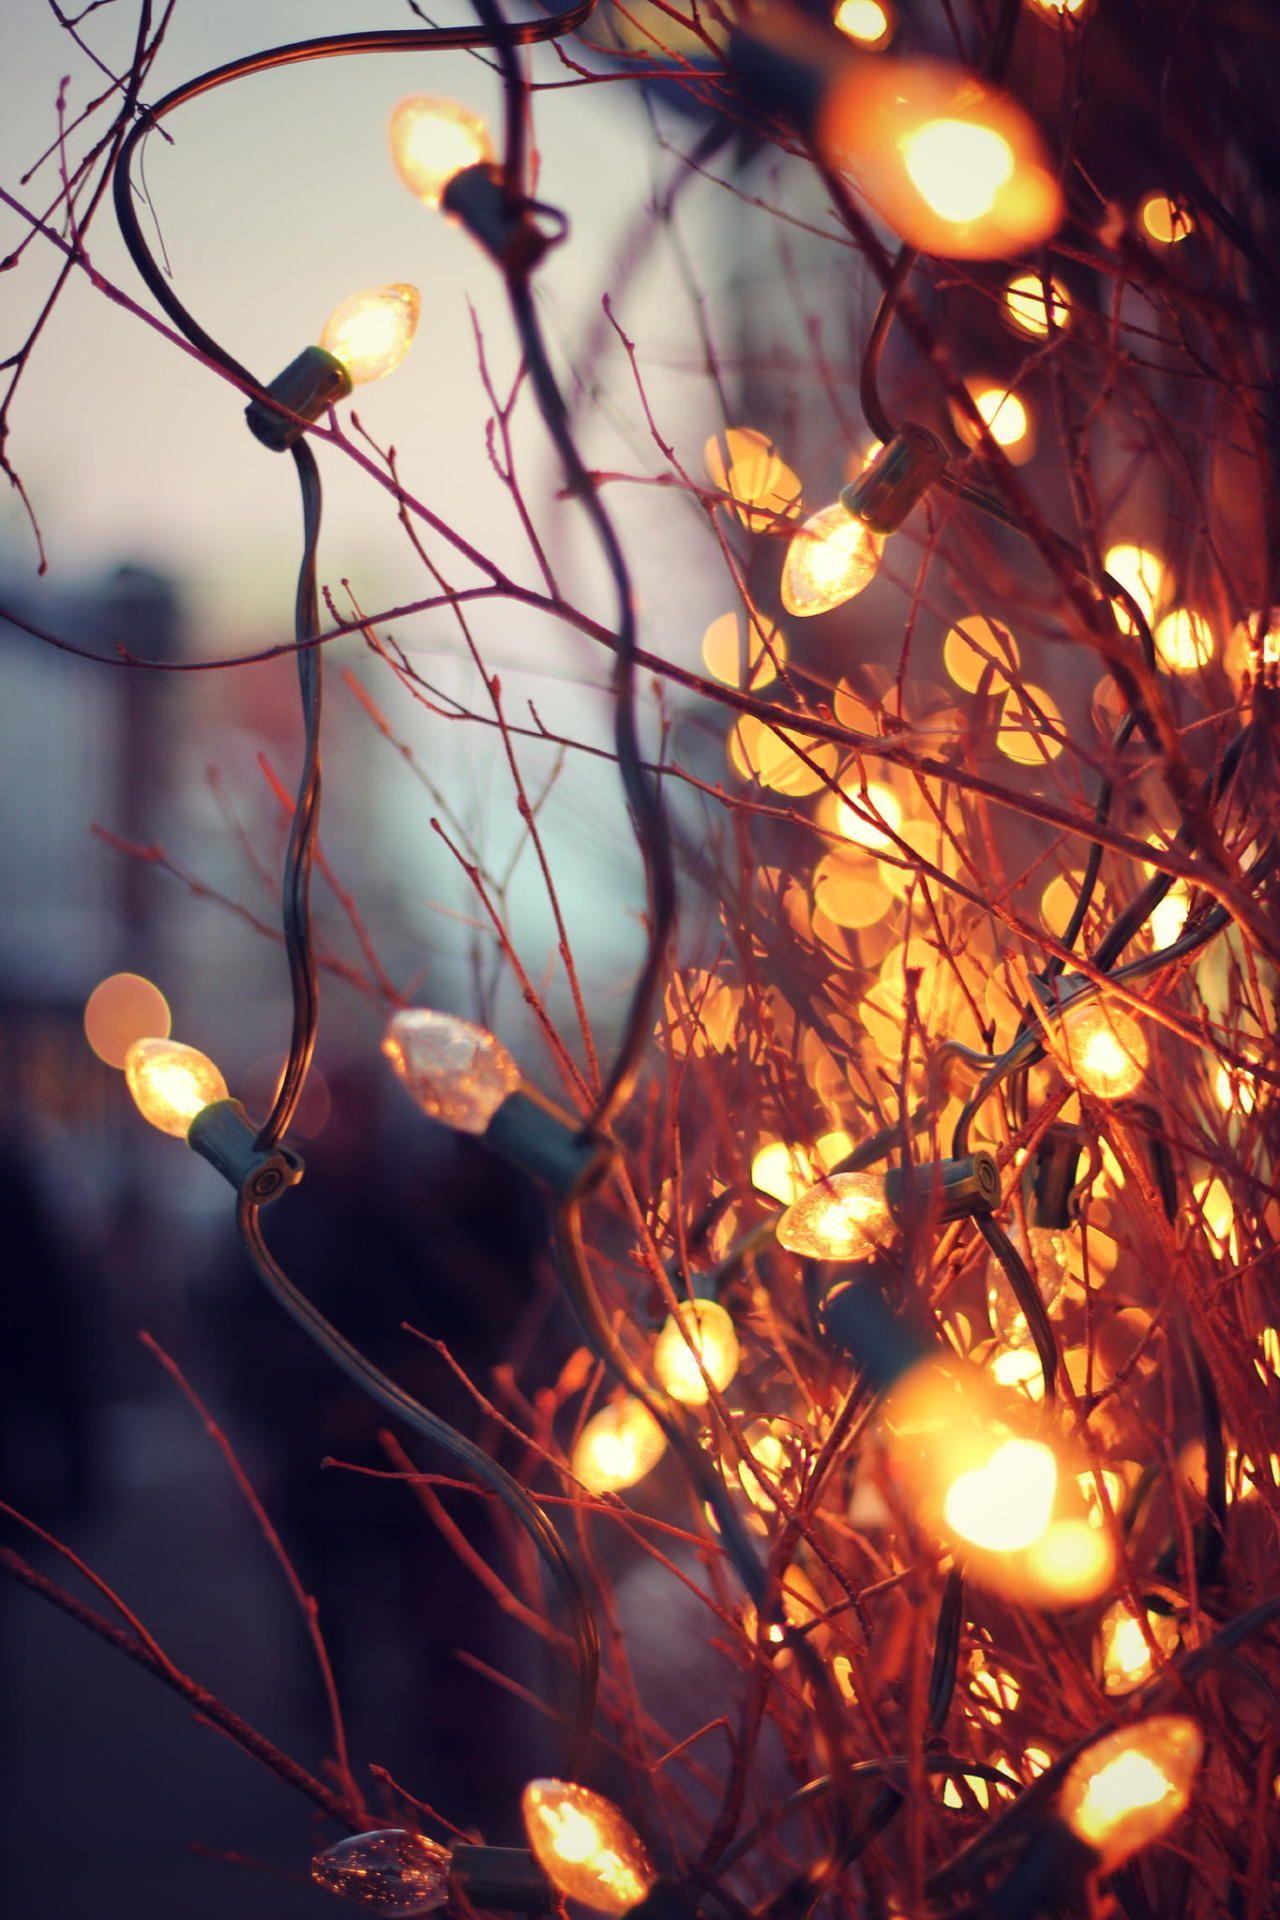 Cold Air Hot Tea Fall Wallpaper Christmas Aesthetic Christmas Wallpaper